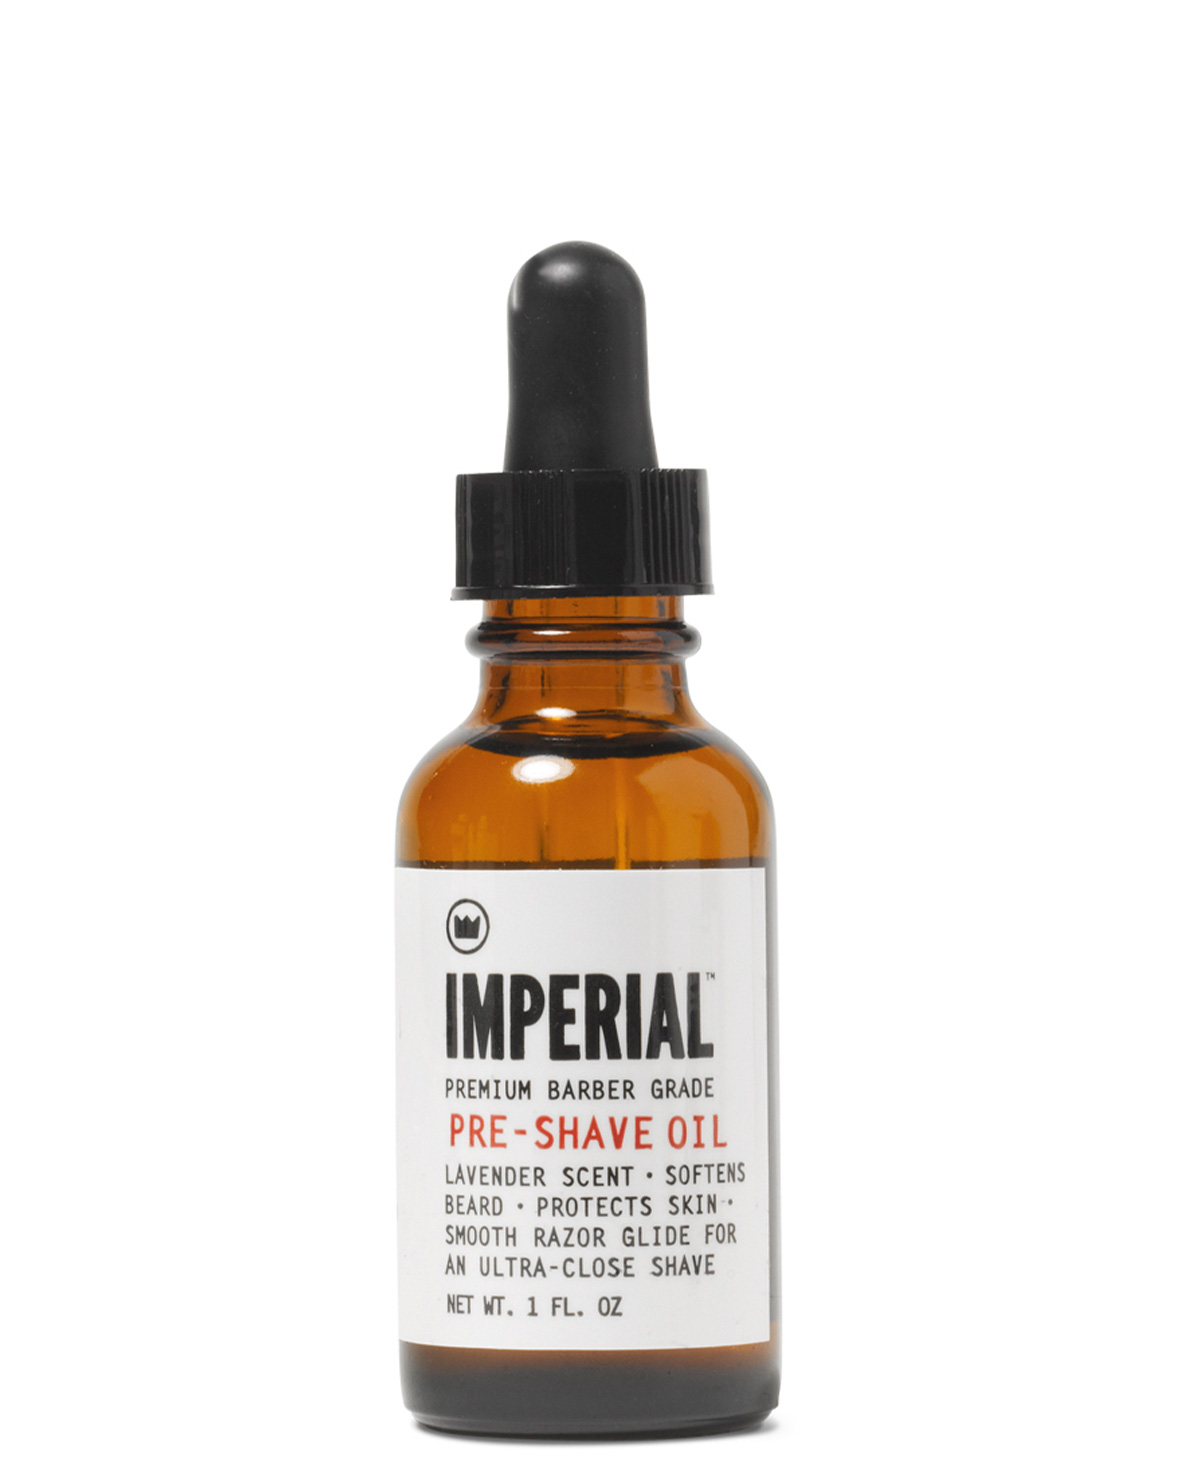 Imperial Pre-Shave Oil & Beard Conditioner 28.35ml